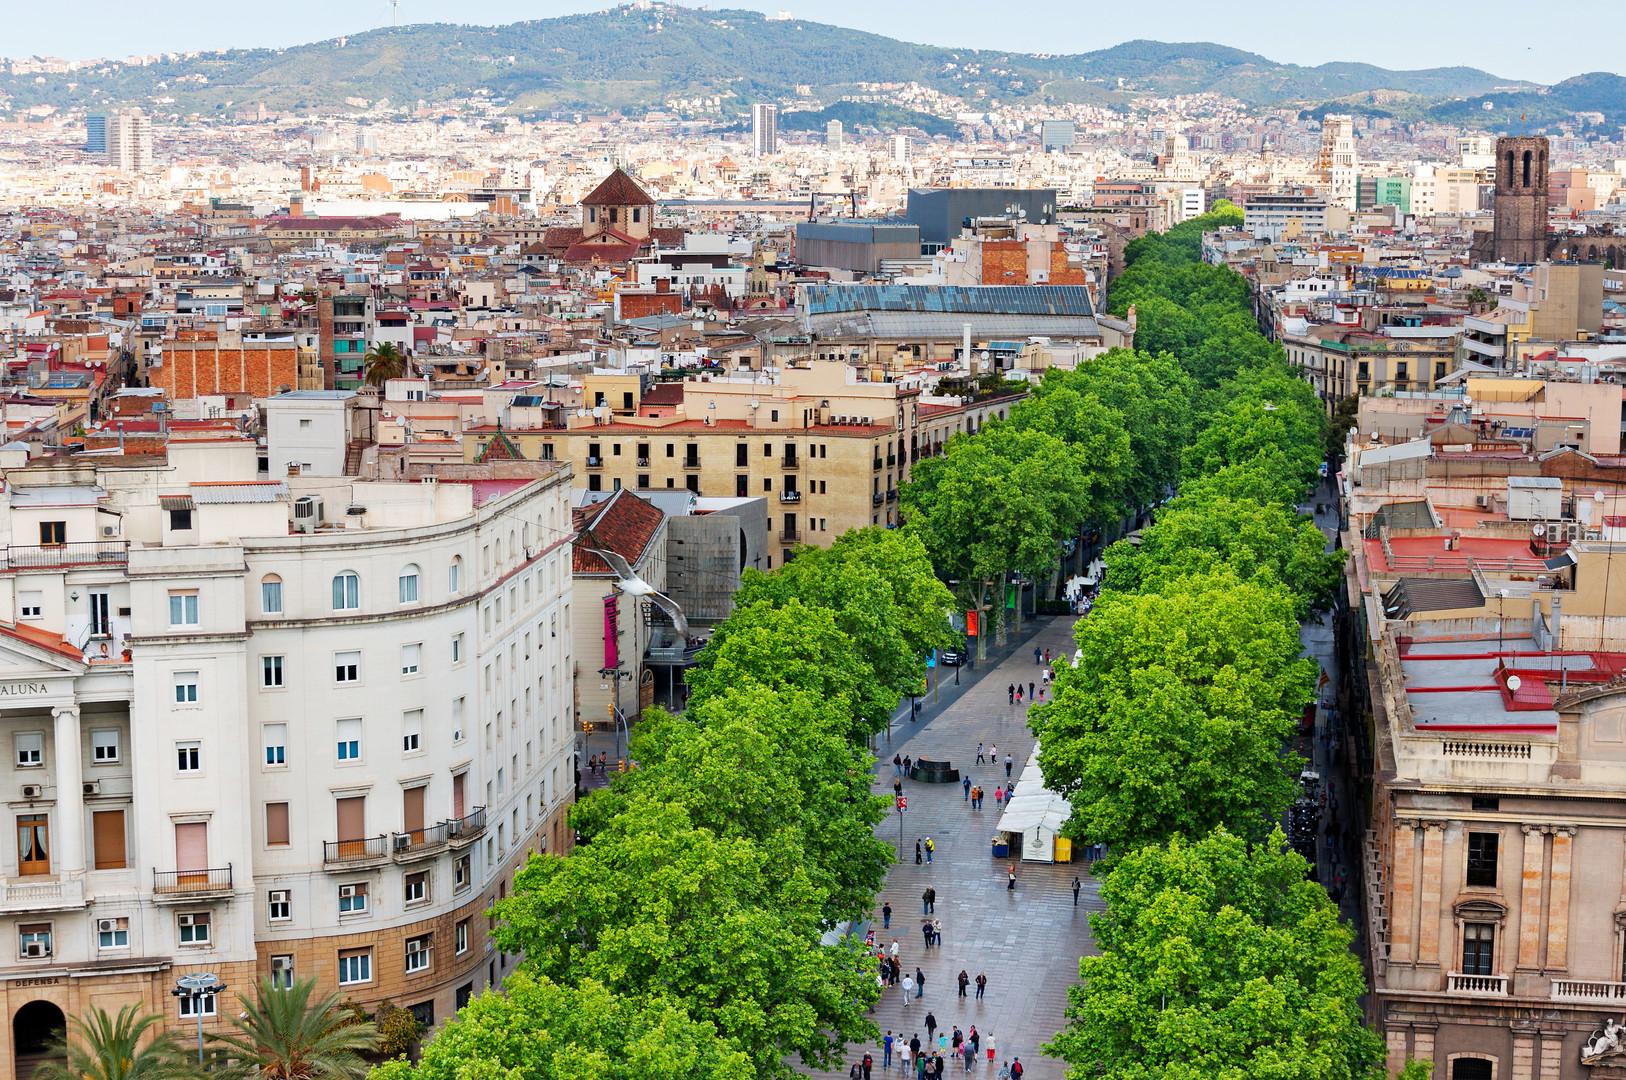 Krásy Katalánska s pobytem u moře #4